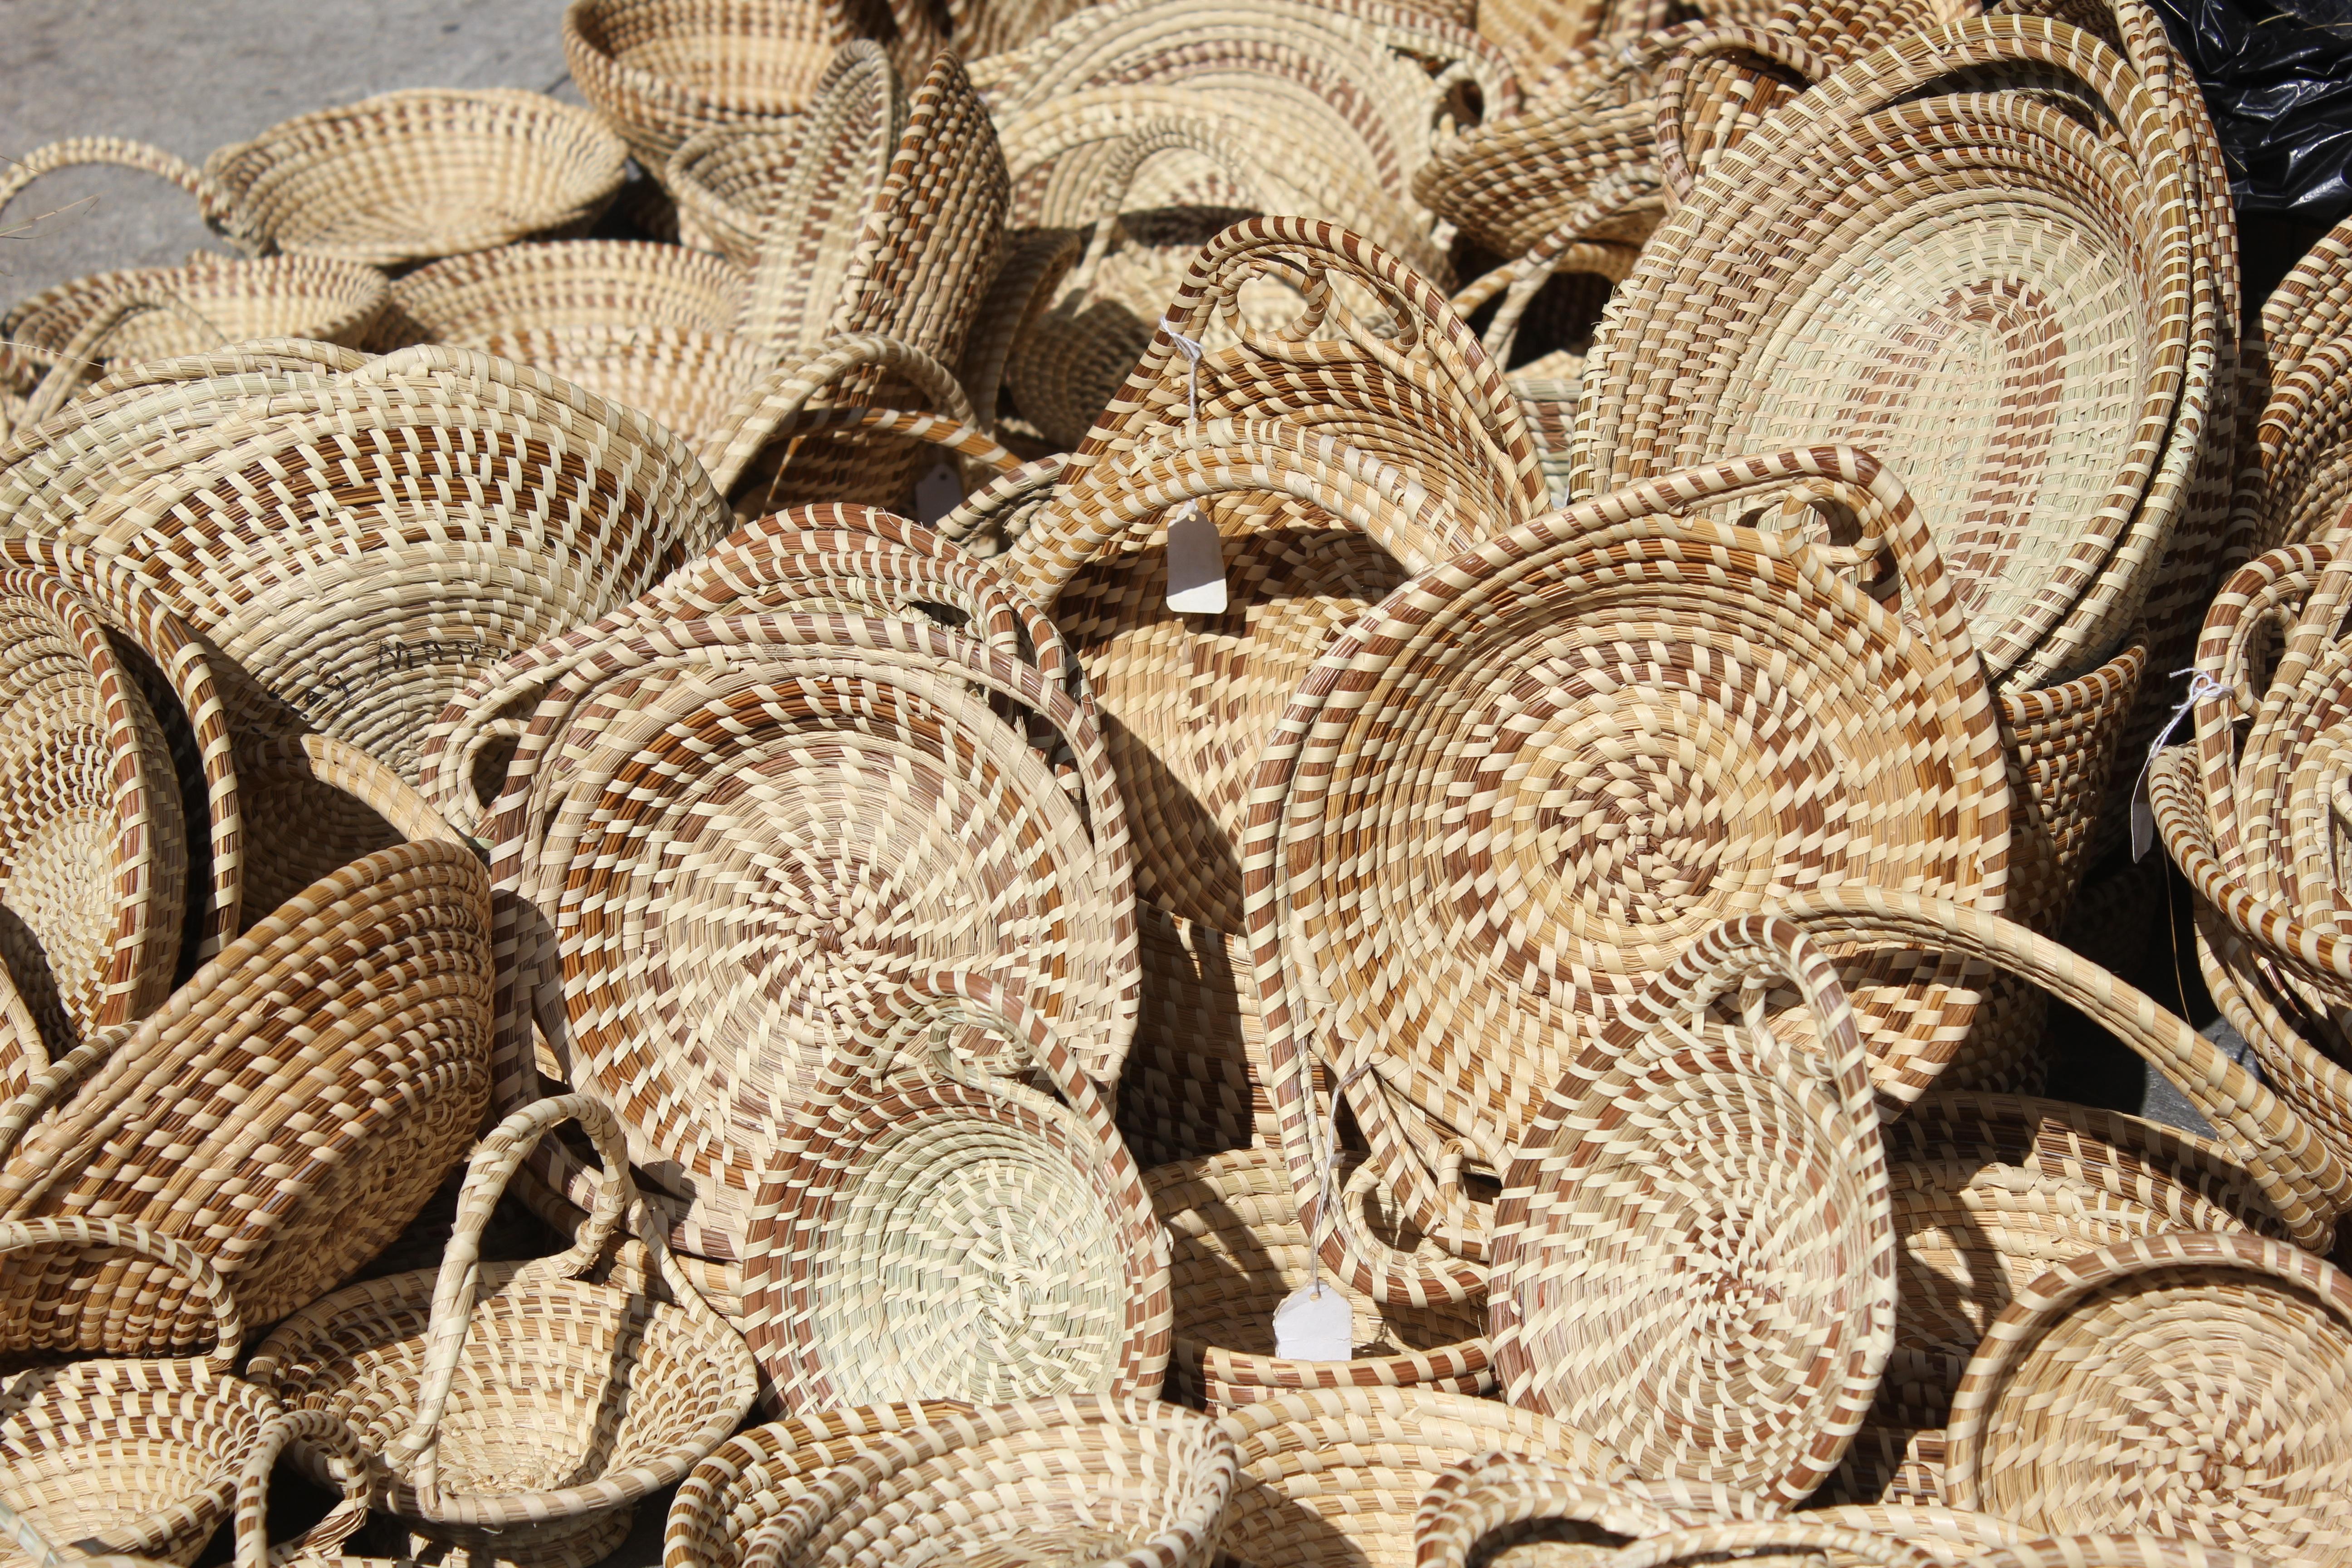 Fotos gratis : cesta, material, mimbre, textil, Paja, Cestas, piso ...